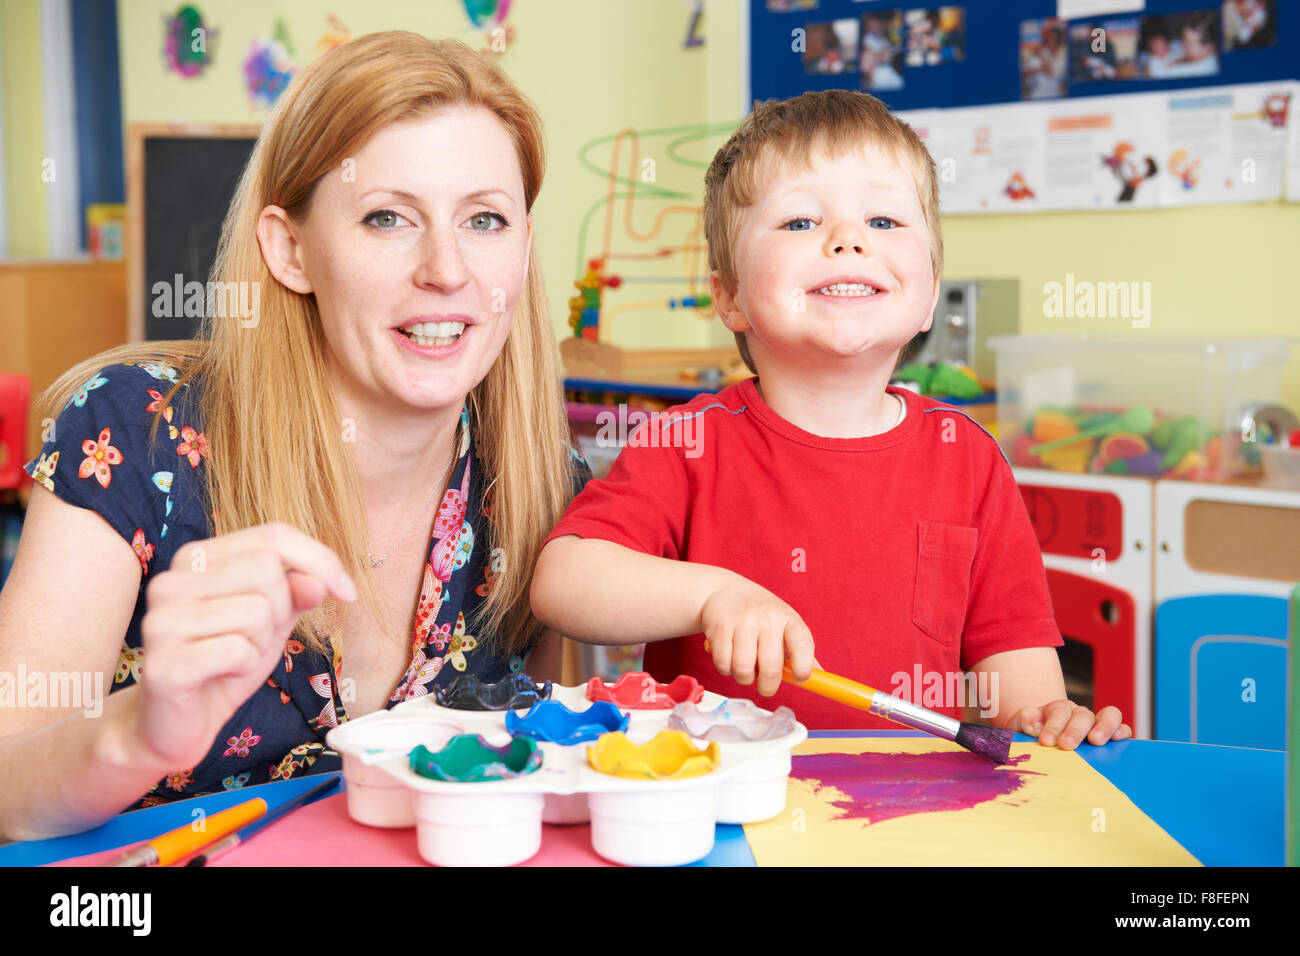 Teacher Helping Preschool Child In Art Class - Stock Image